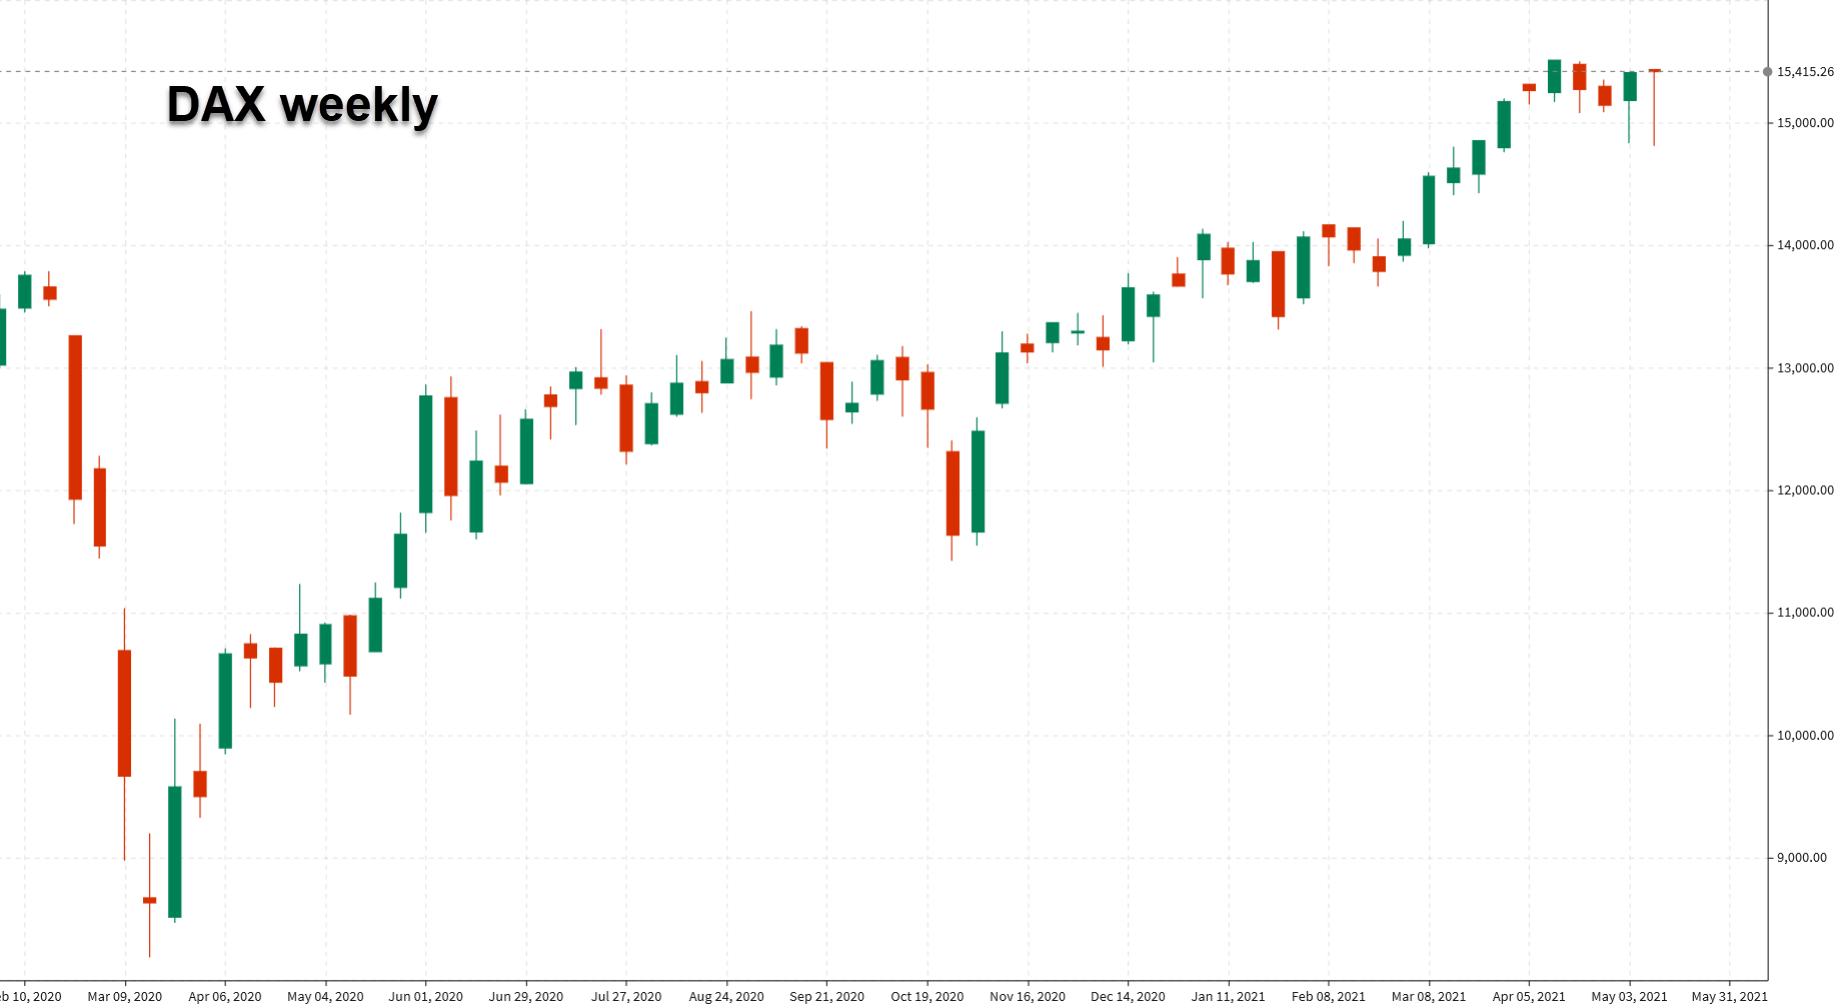 DAX weekly chart